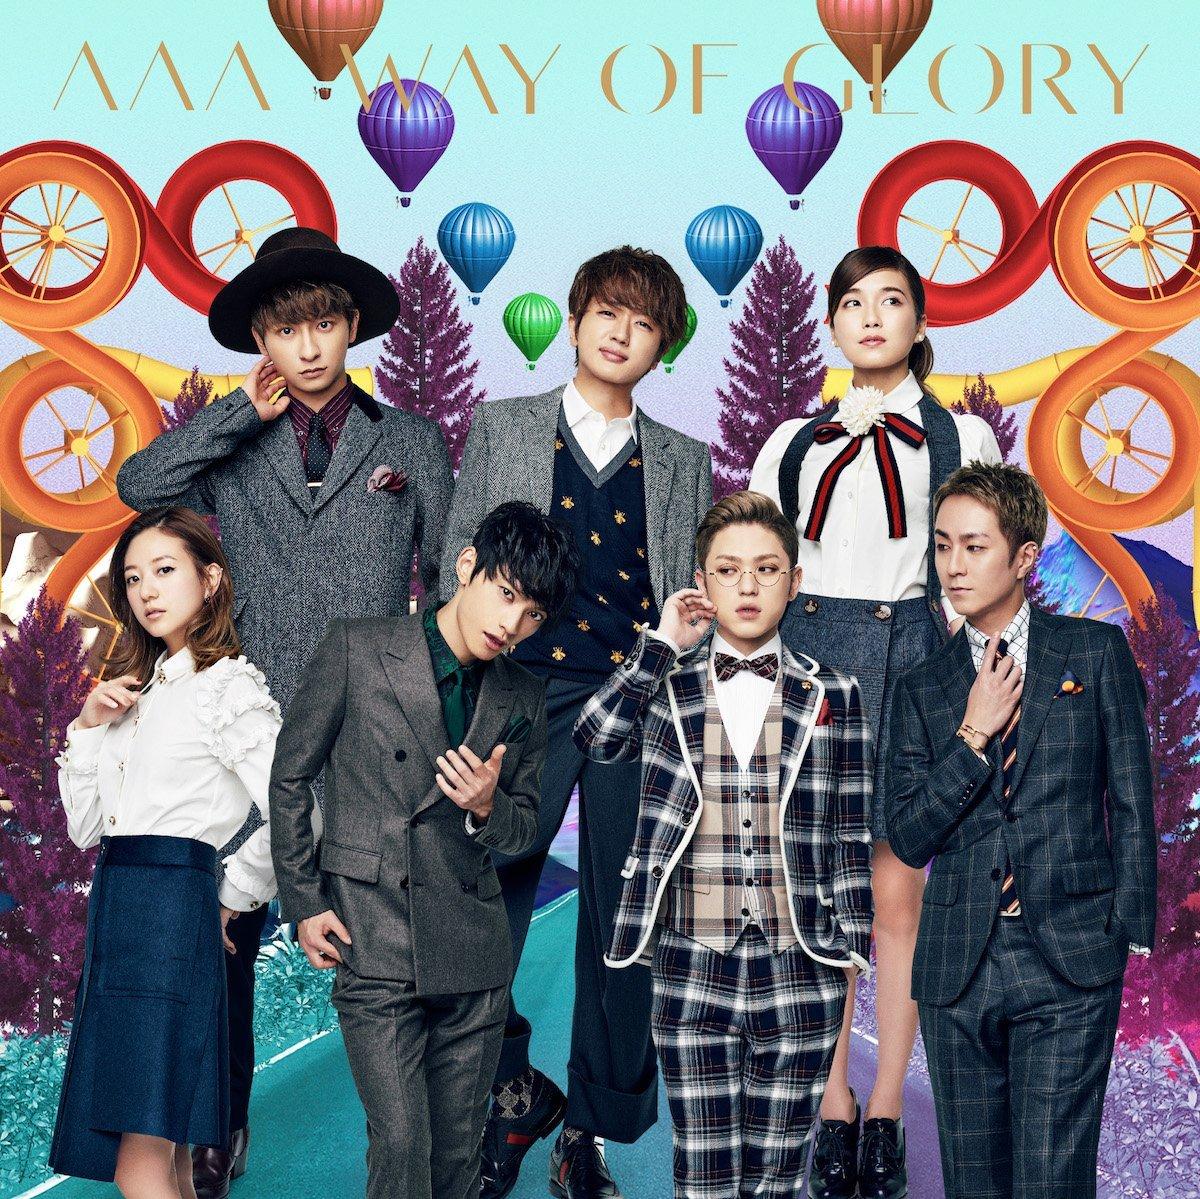 20170221.04.41 AAA - Way of Glory (DVD) (JPOP.ru) cover 1.jpg